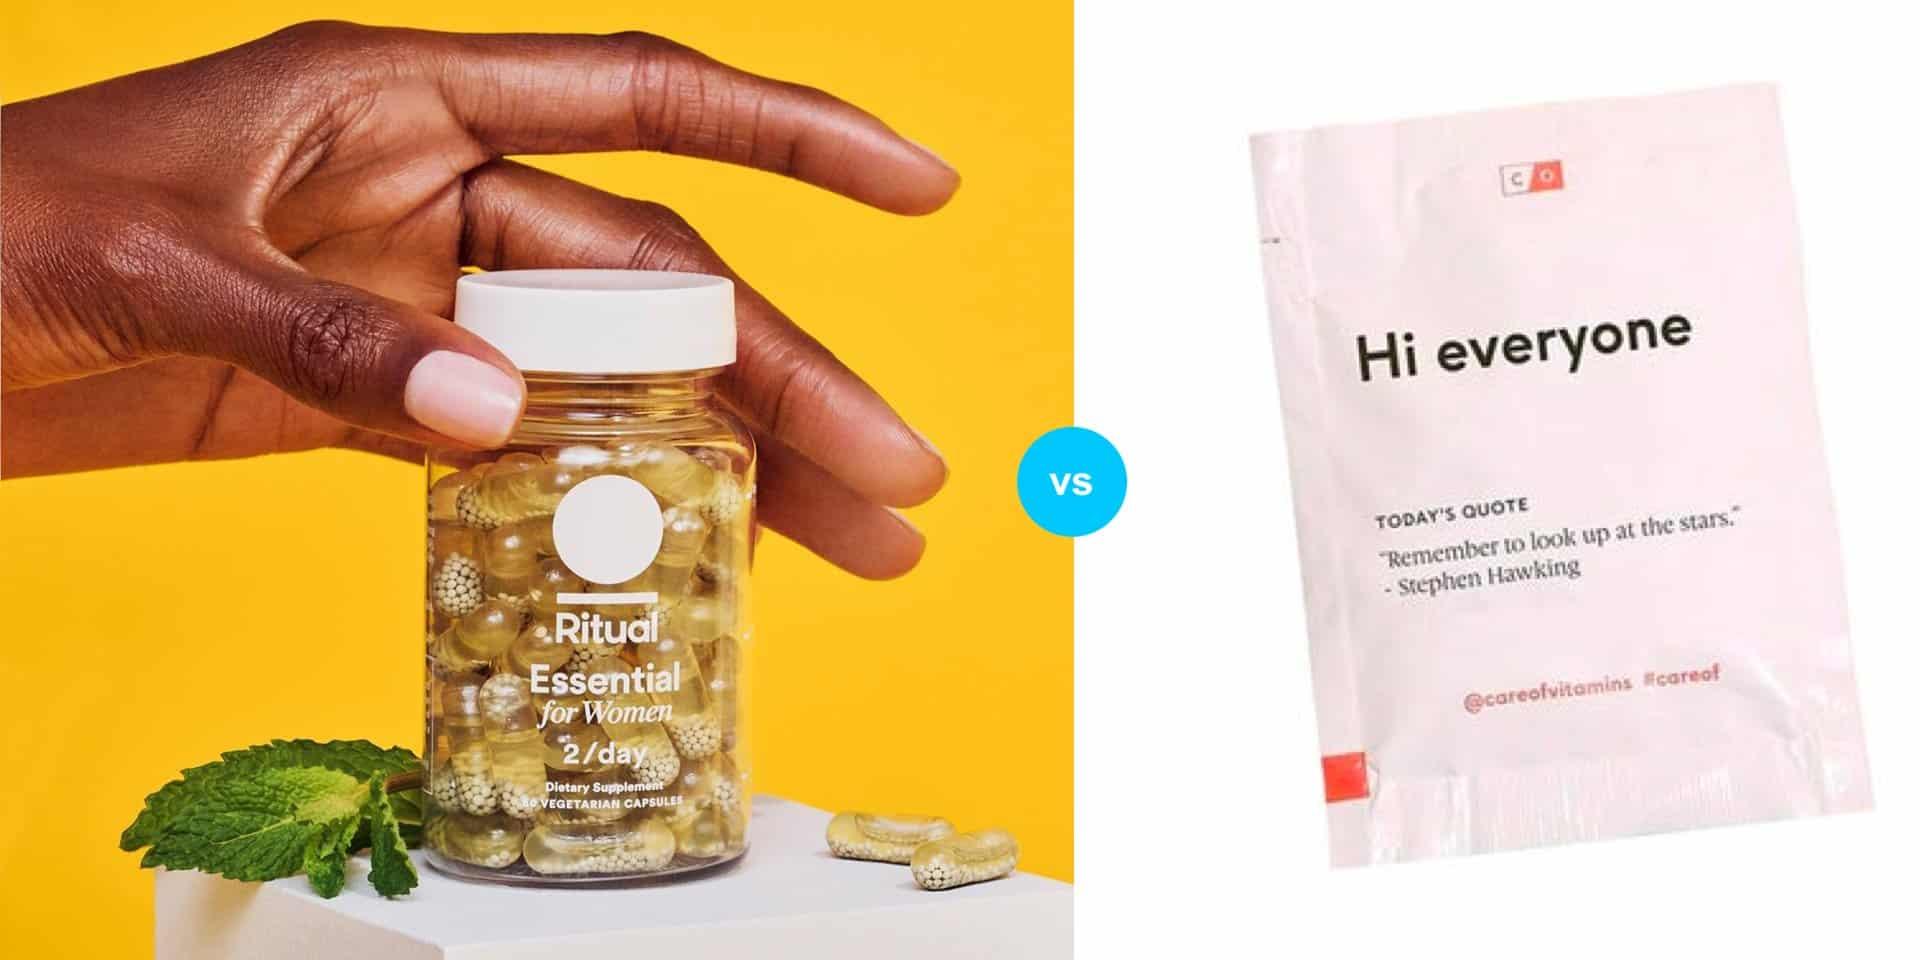 Ritual vs Care/Of vs Honest Co. Womens Vitamins